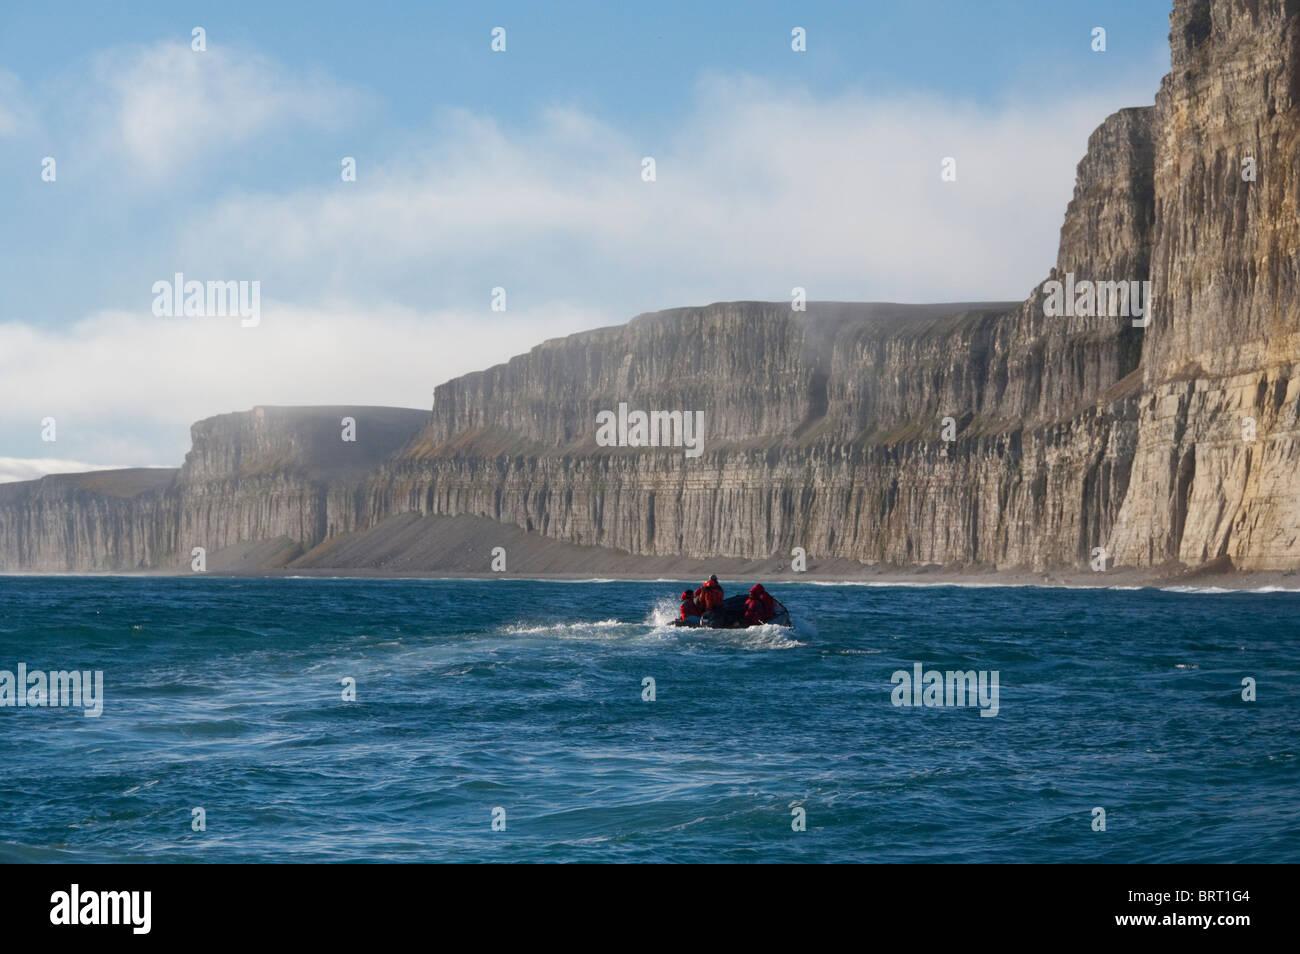 Canada, Nunavut, Qikiqtaaluk Region, Akpatok Island. Tourists in zodiac. - Stock Image